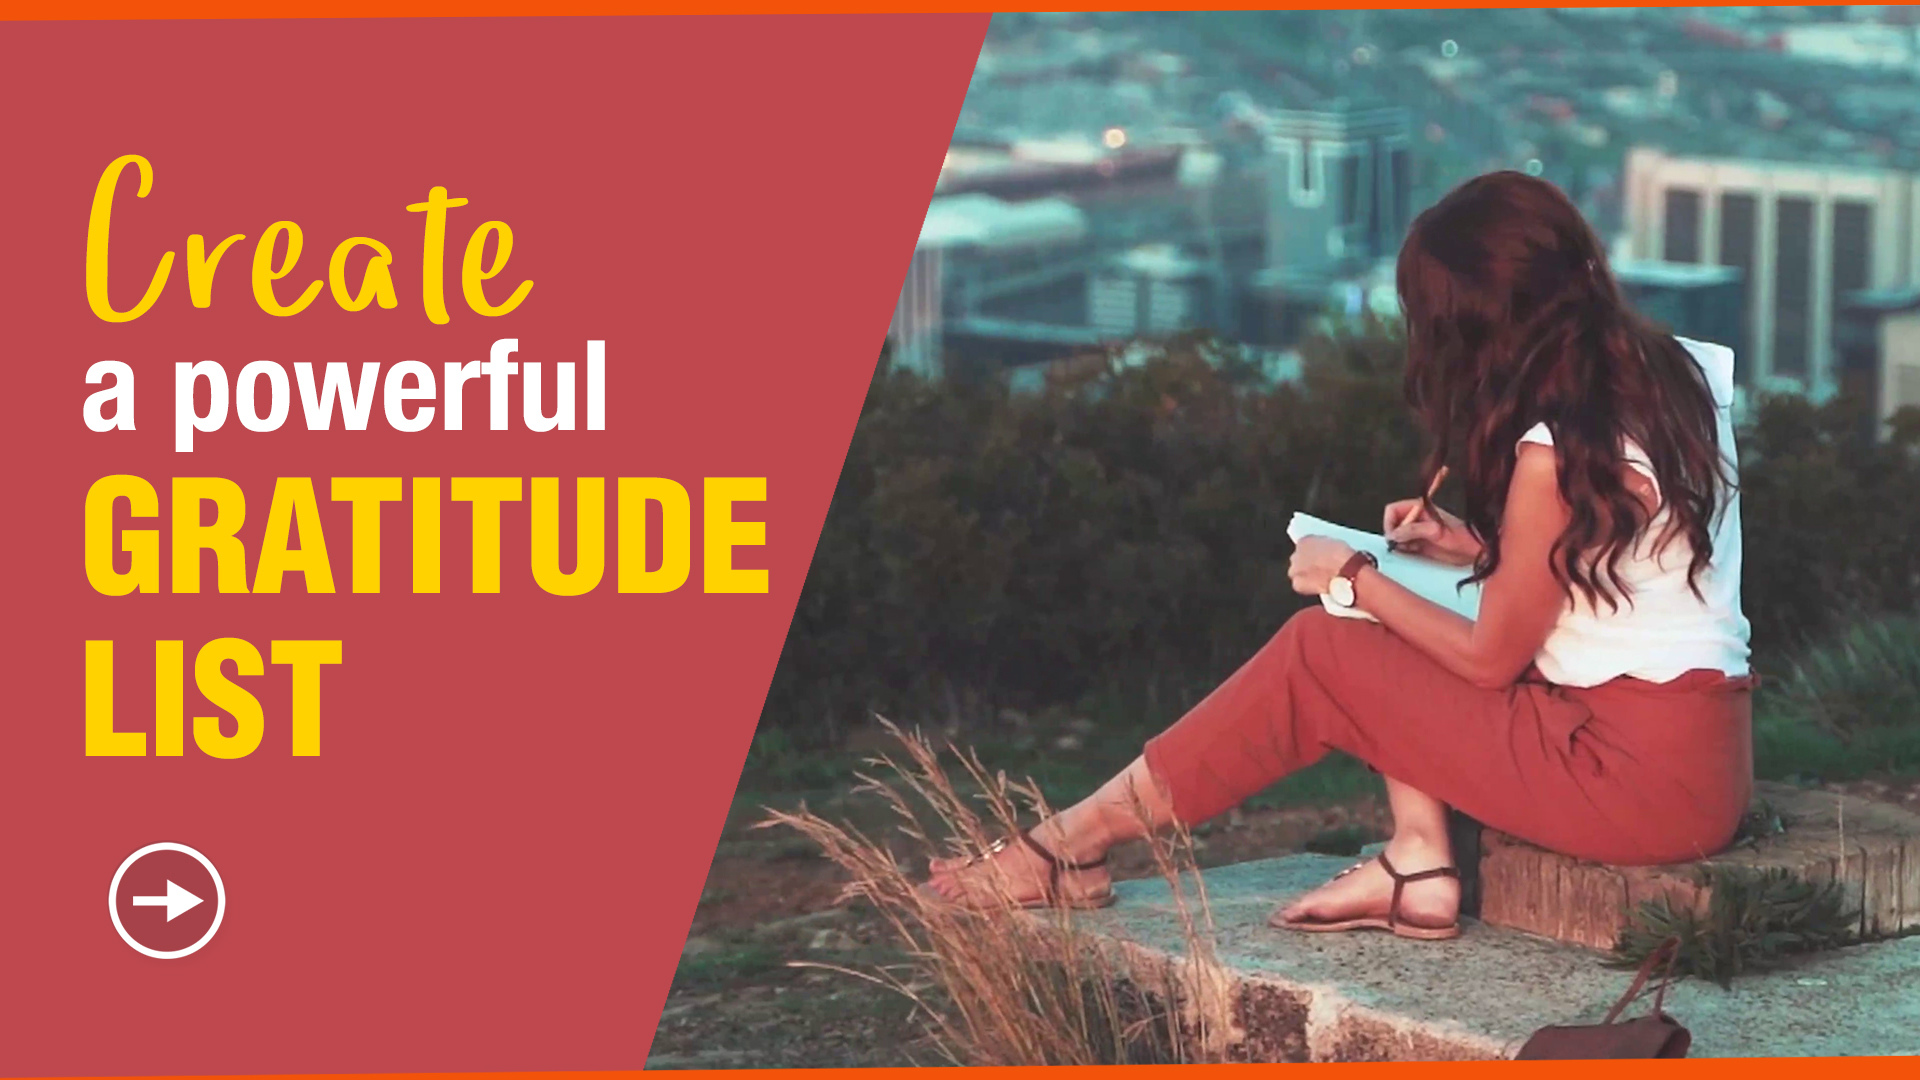 Create a Powerful Gratitude List blog by Paresh Rawal